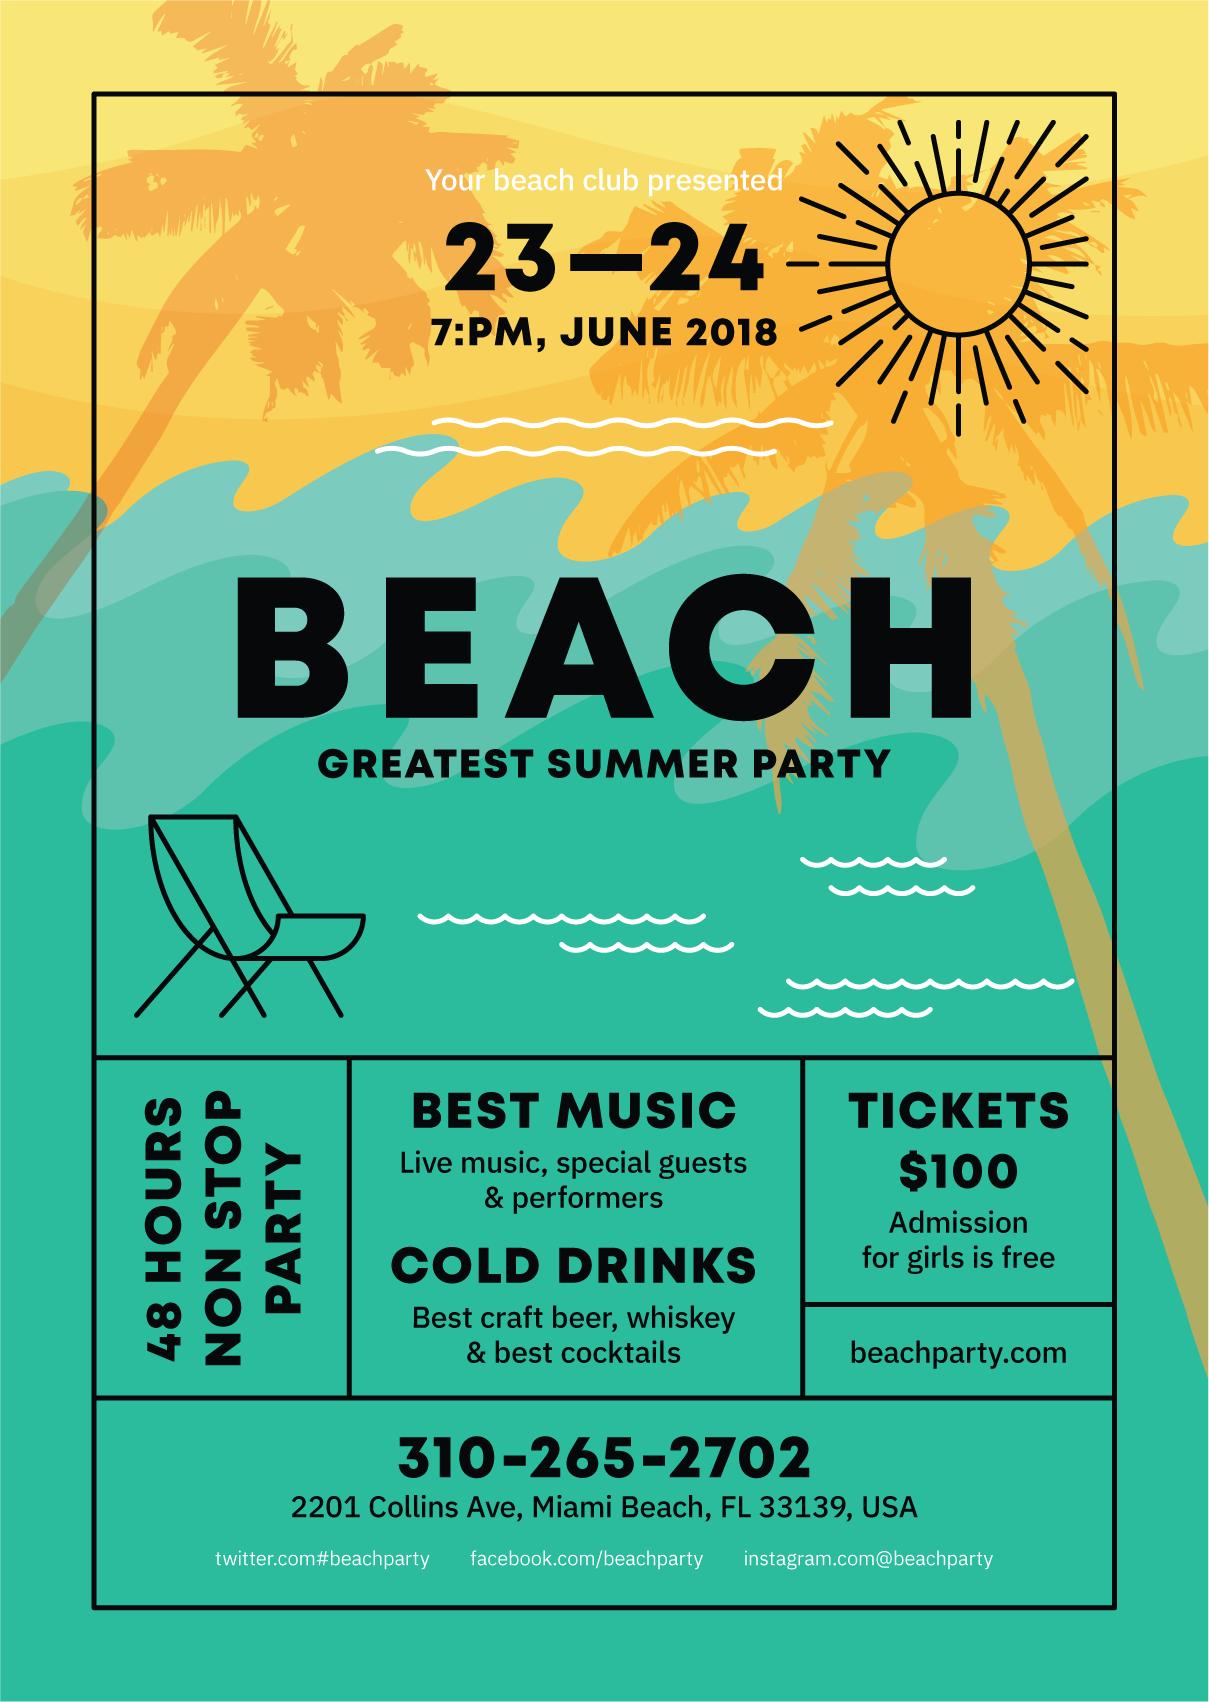 Beach Poster Template Event Poster Design Layout Poster Design Software Event Poster Design